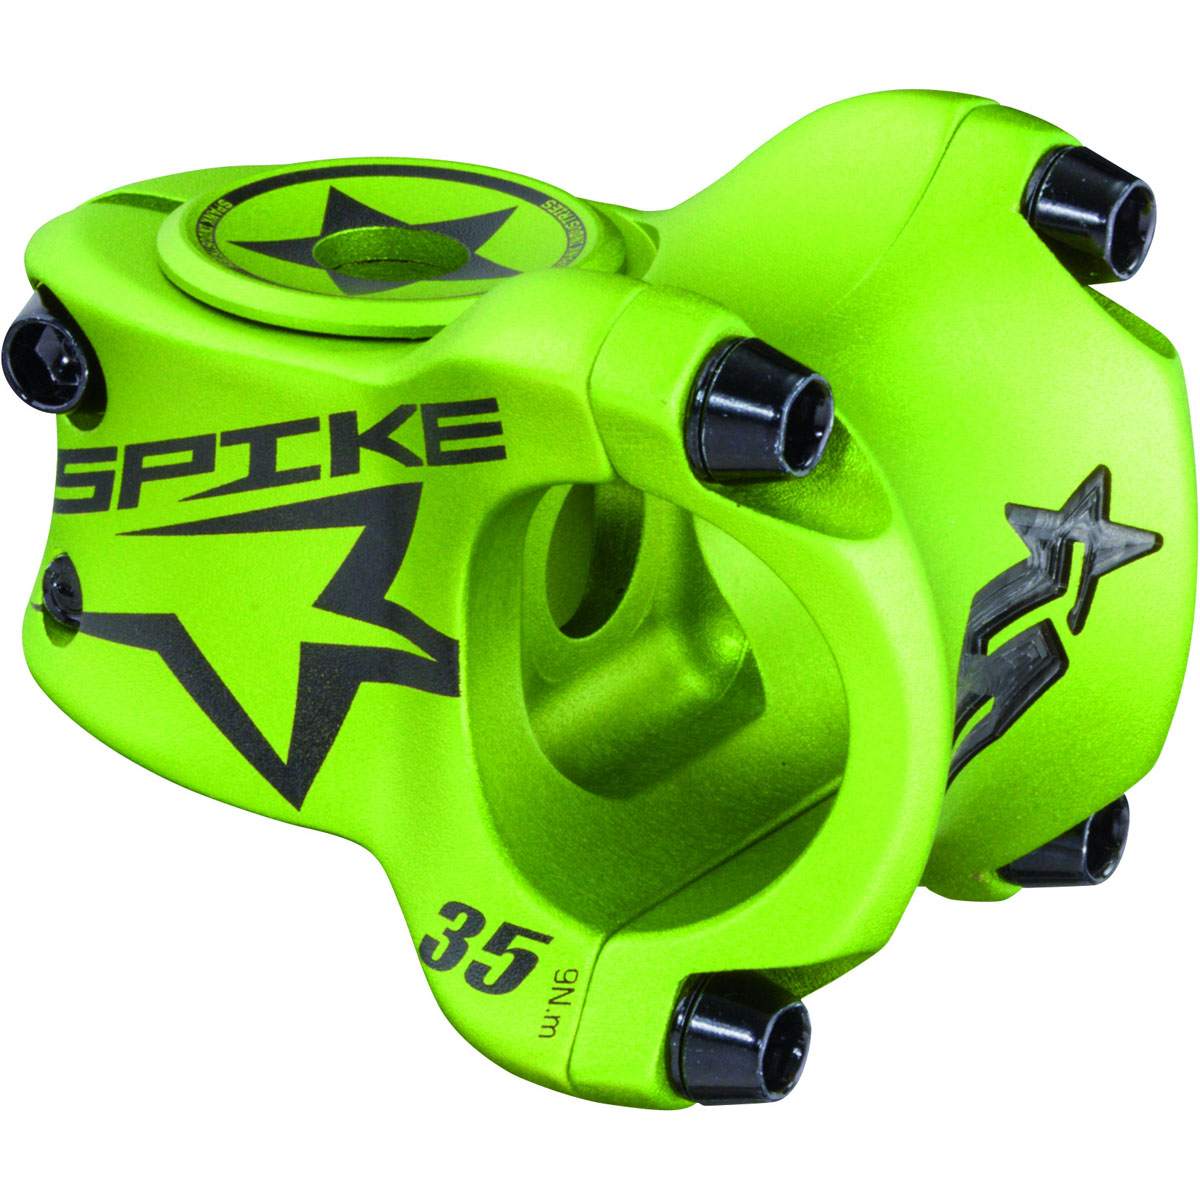 Spank SPIKE Race Bead-Blast Finish Bicycle Stem - 35mm - E06SK011